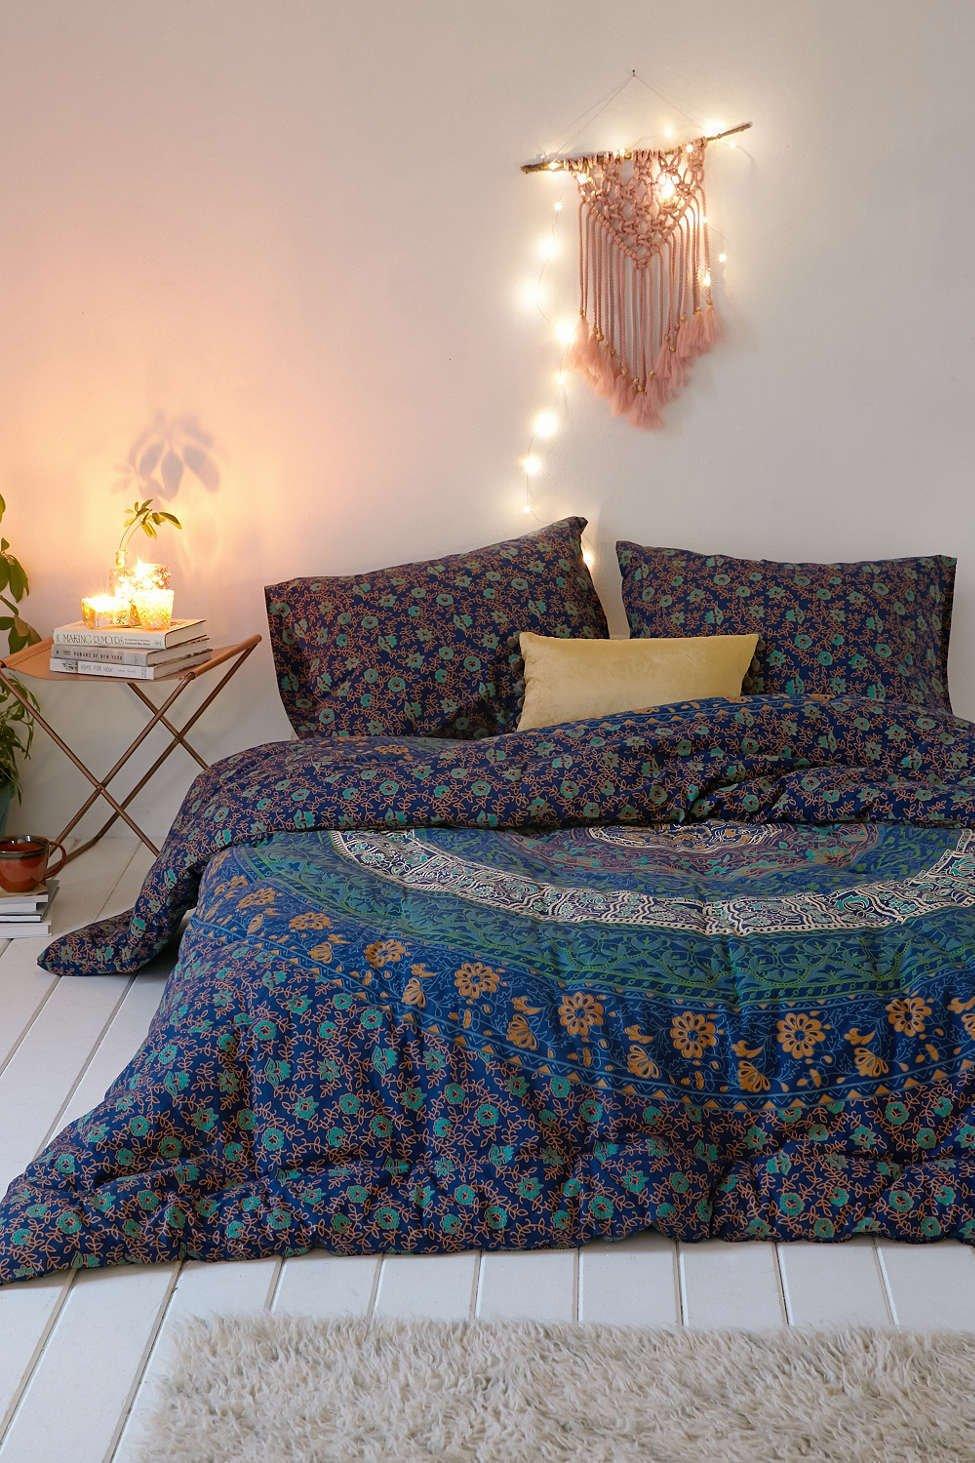 Sophia Art Exclusive Bohemian Indian Mandala Duvet Queen Quilt with Pillowcases, Mandala Quilt Cover, Boho Duvet Cover, doona Cover (Multi) with Magazine Holder Letter Holder Wall Hanging